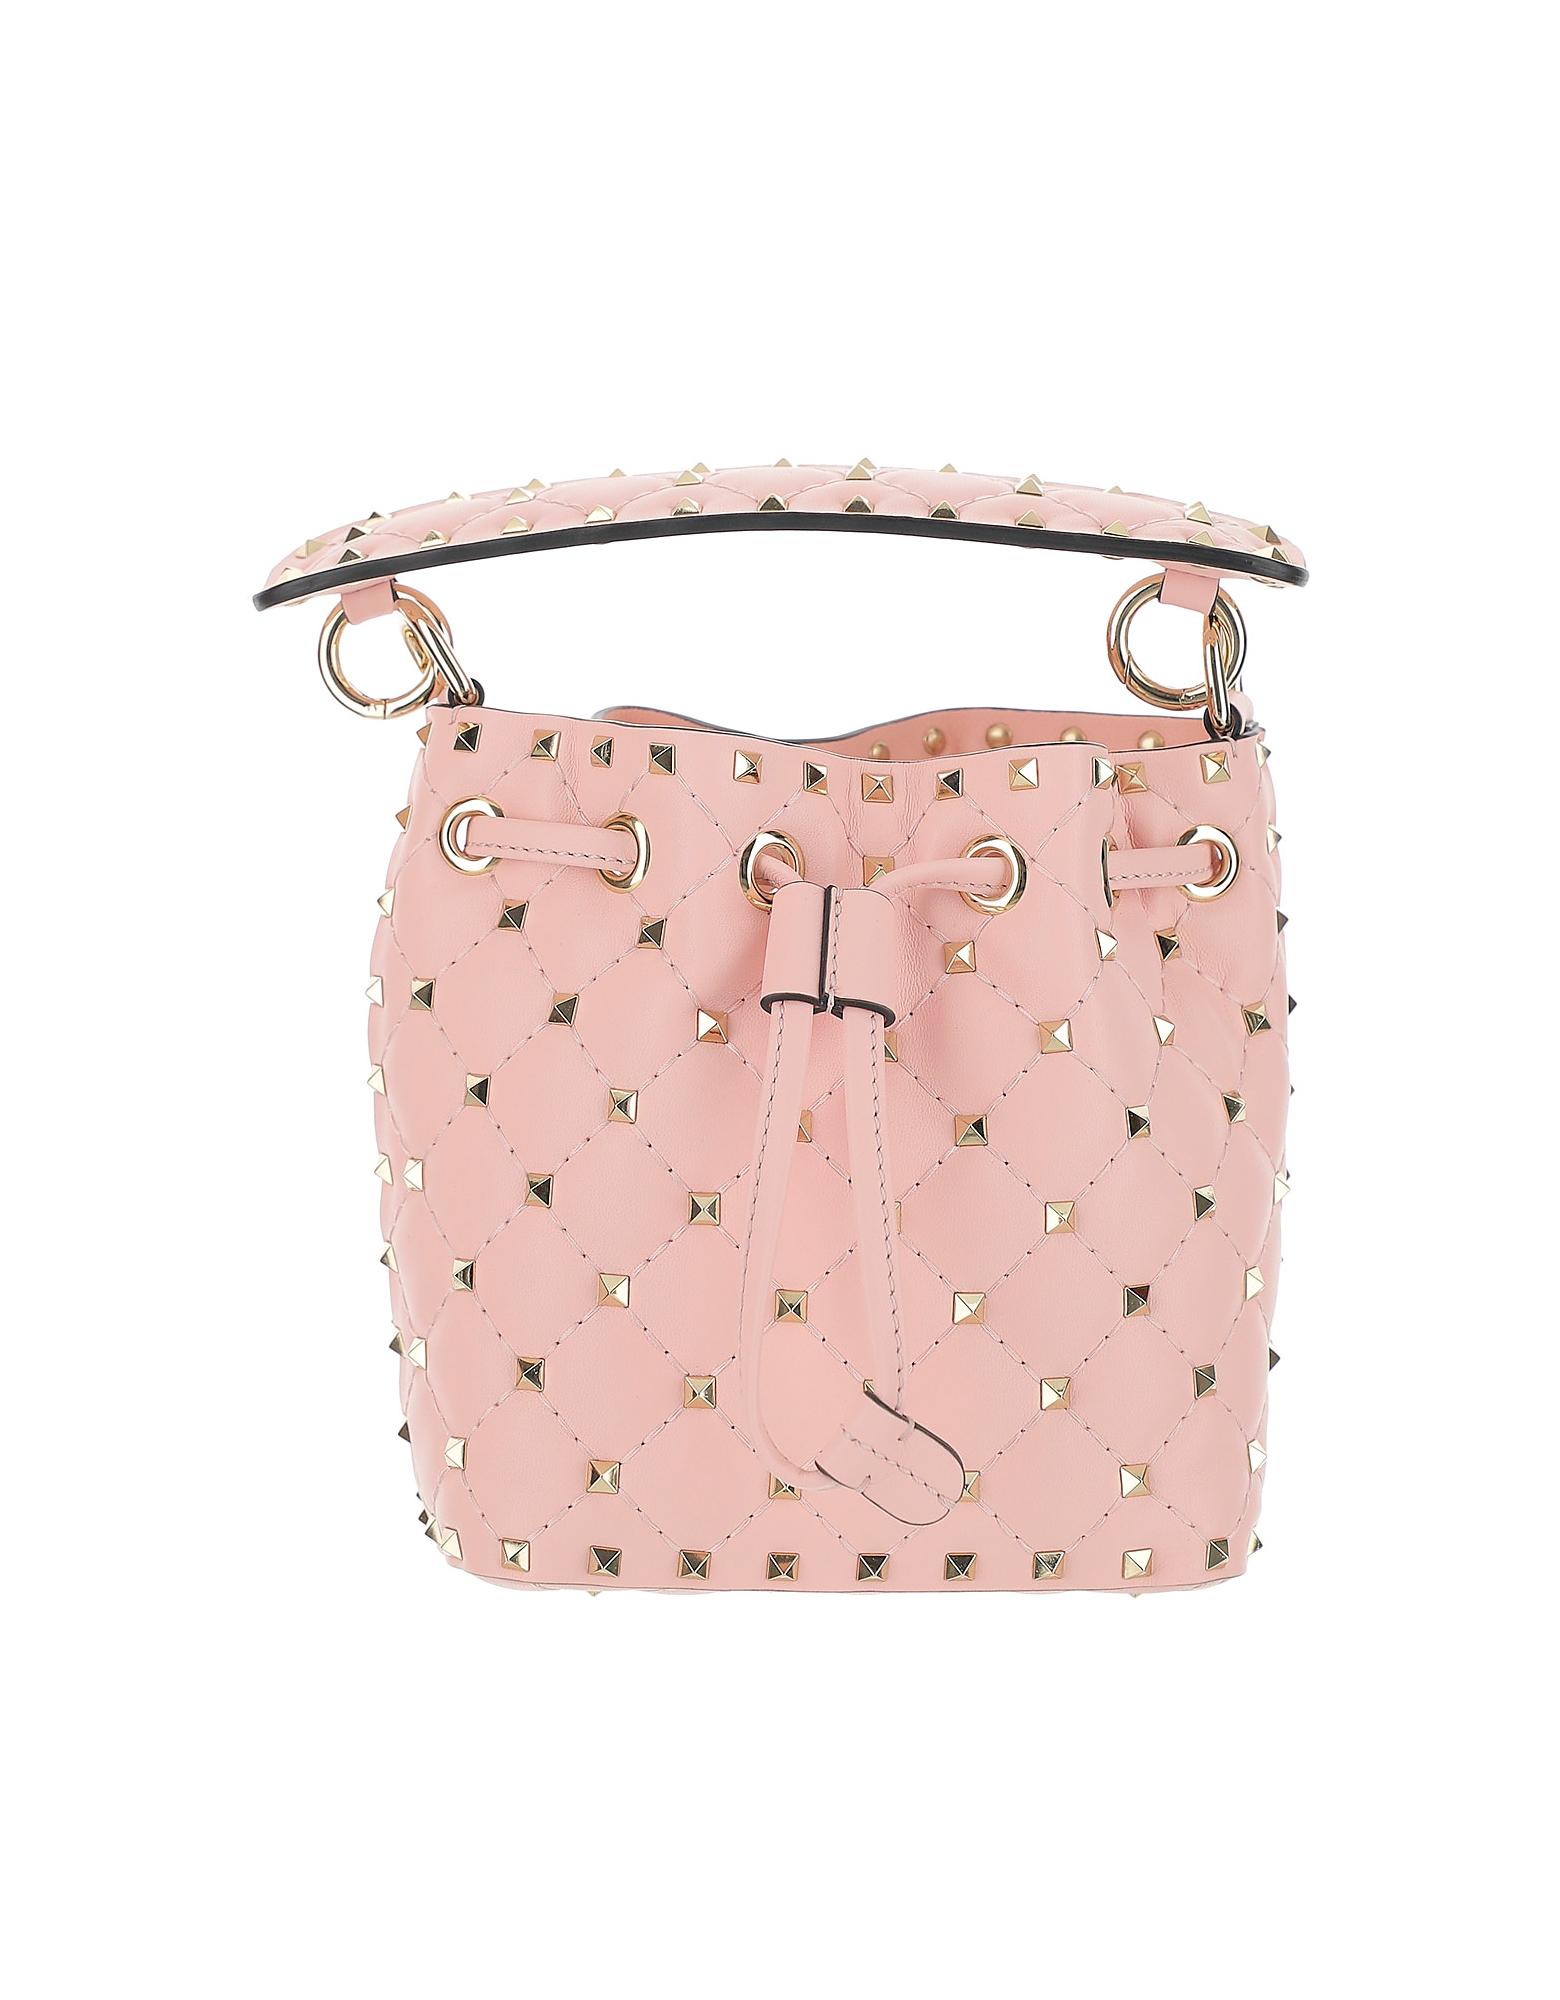 Valentino Designer Handbags, Pink Leather Mini Rockstud Bucket Bag